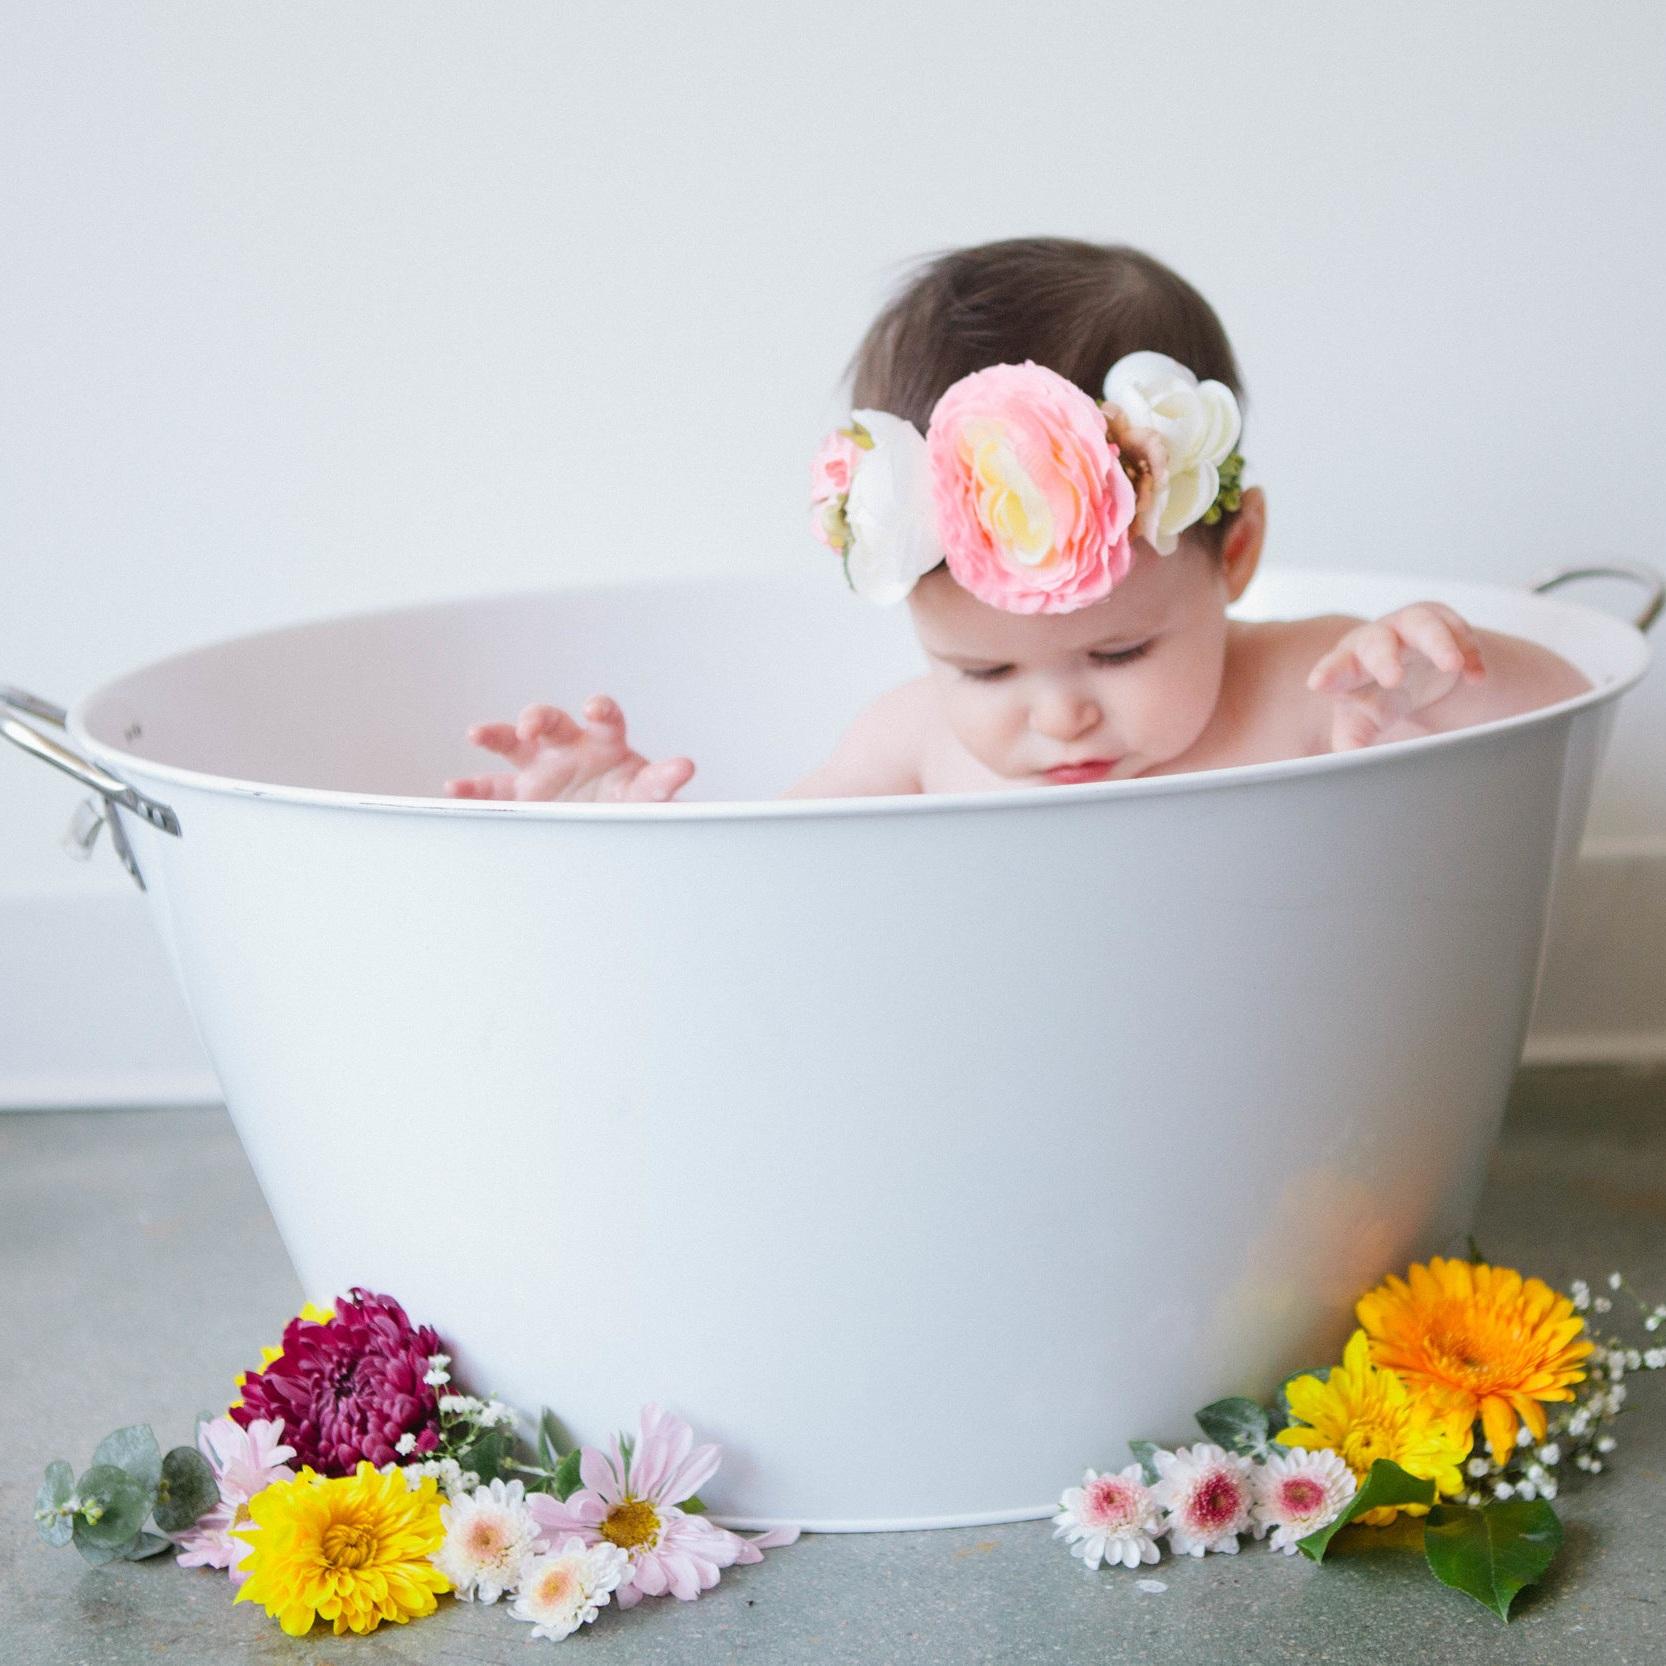 cake smash and milk bath photos -